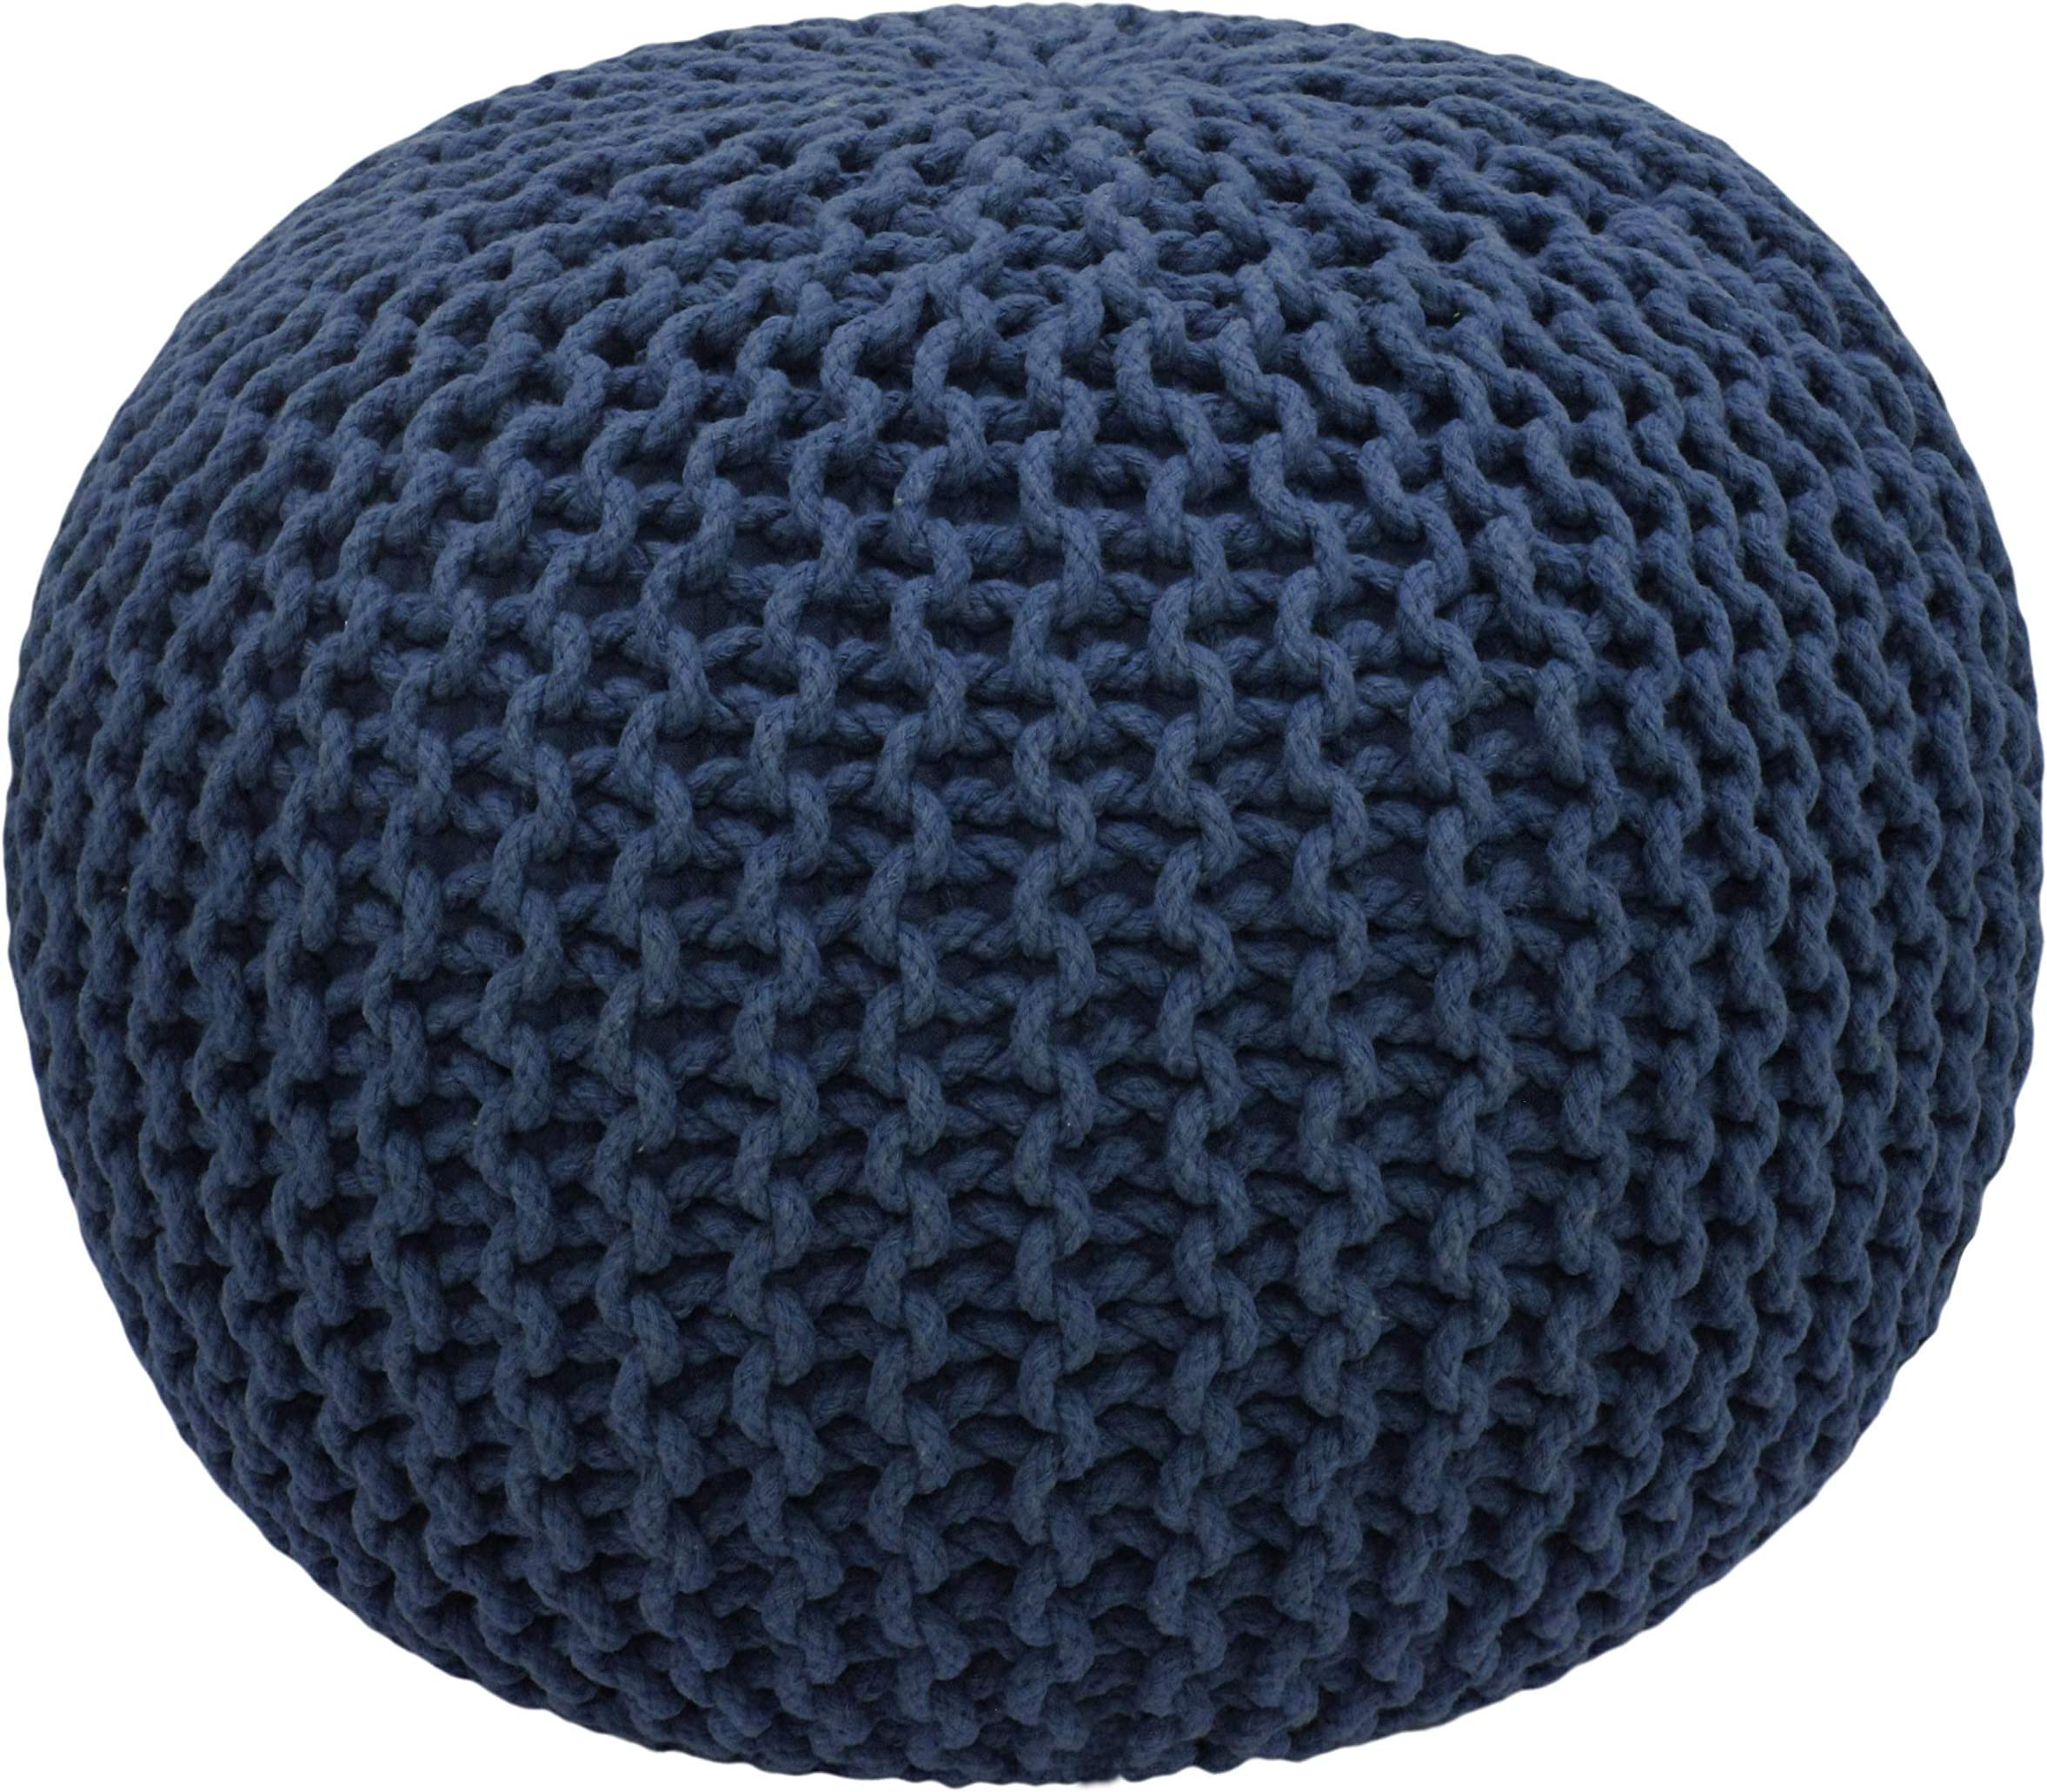 wool knit chair-ottoman-livingroom-soft wool chair-sitting bag-floor pillow-kids floor pillow-floor pouf-chunky wool-home decor